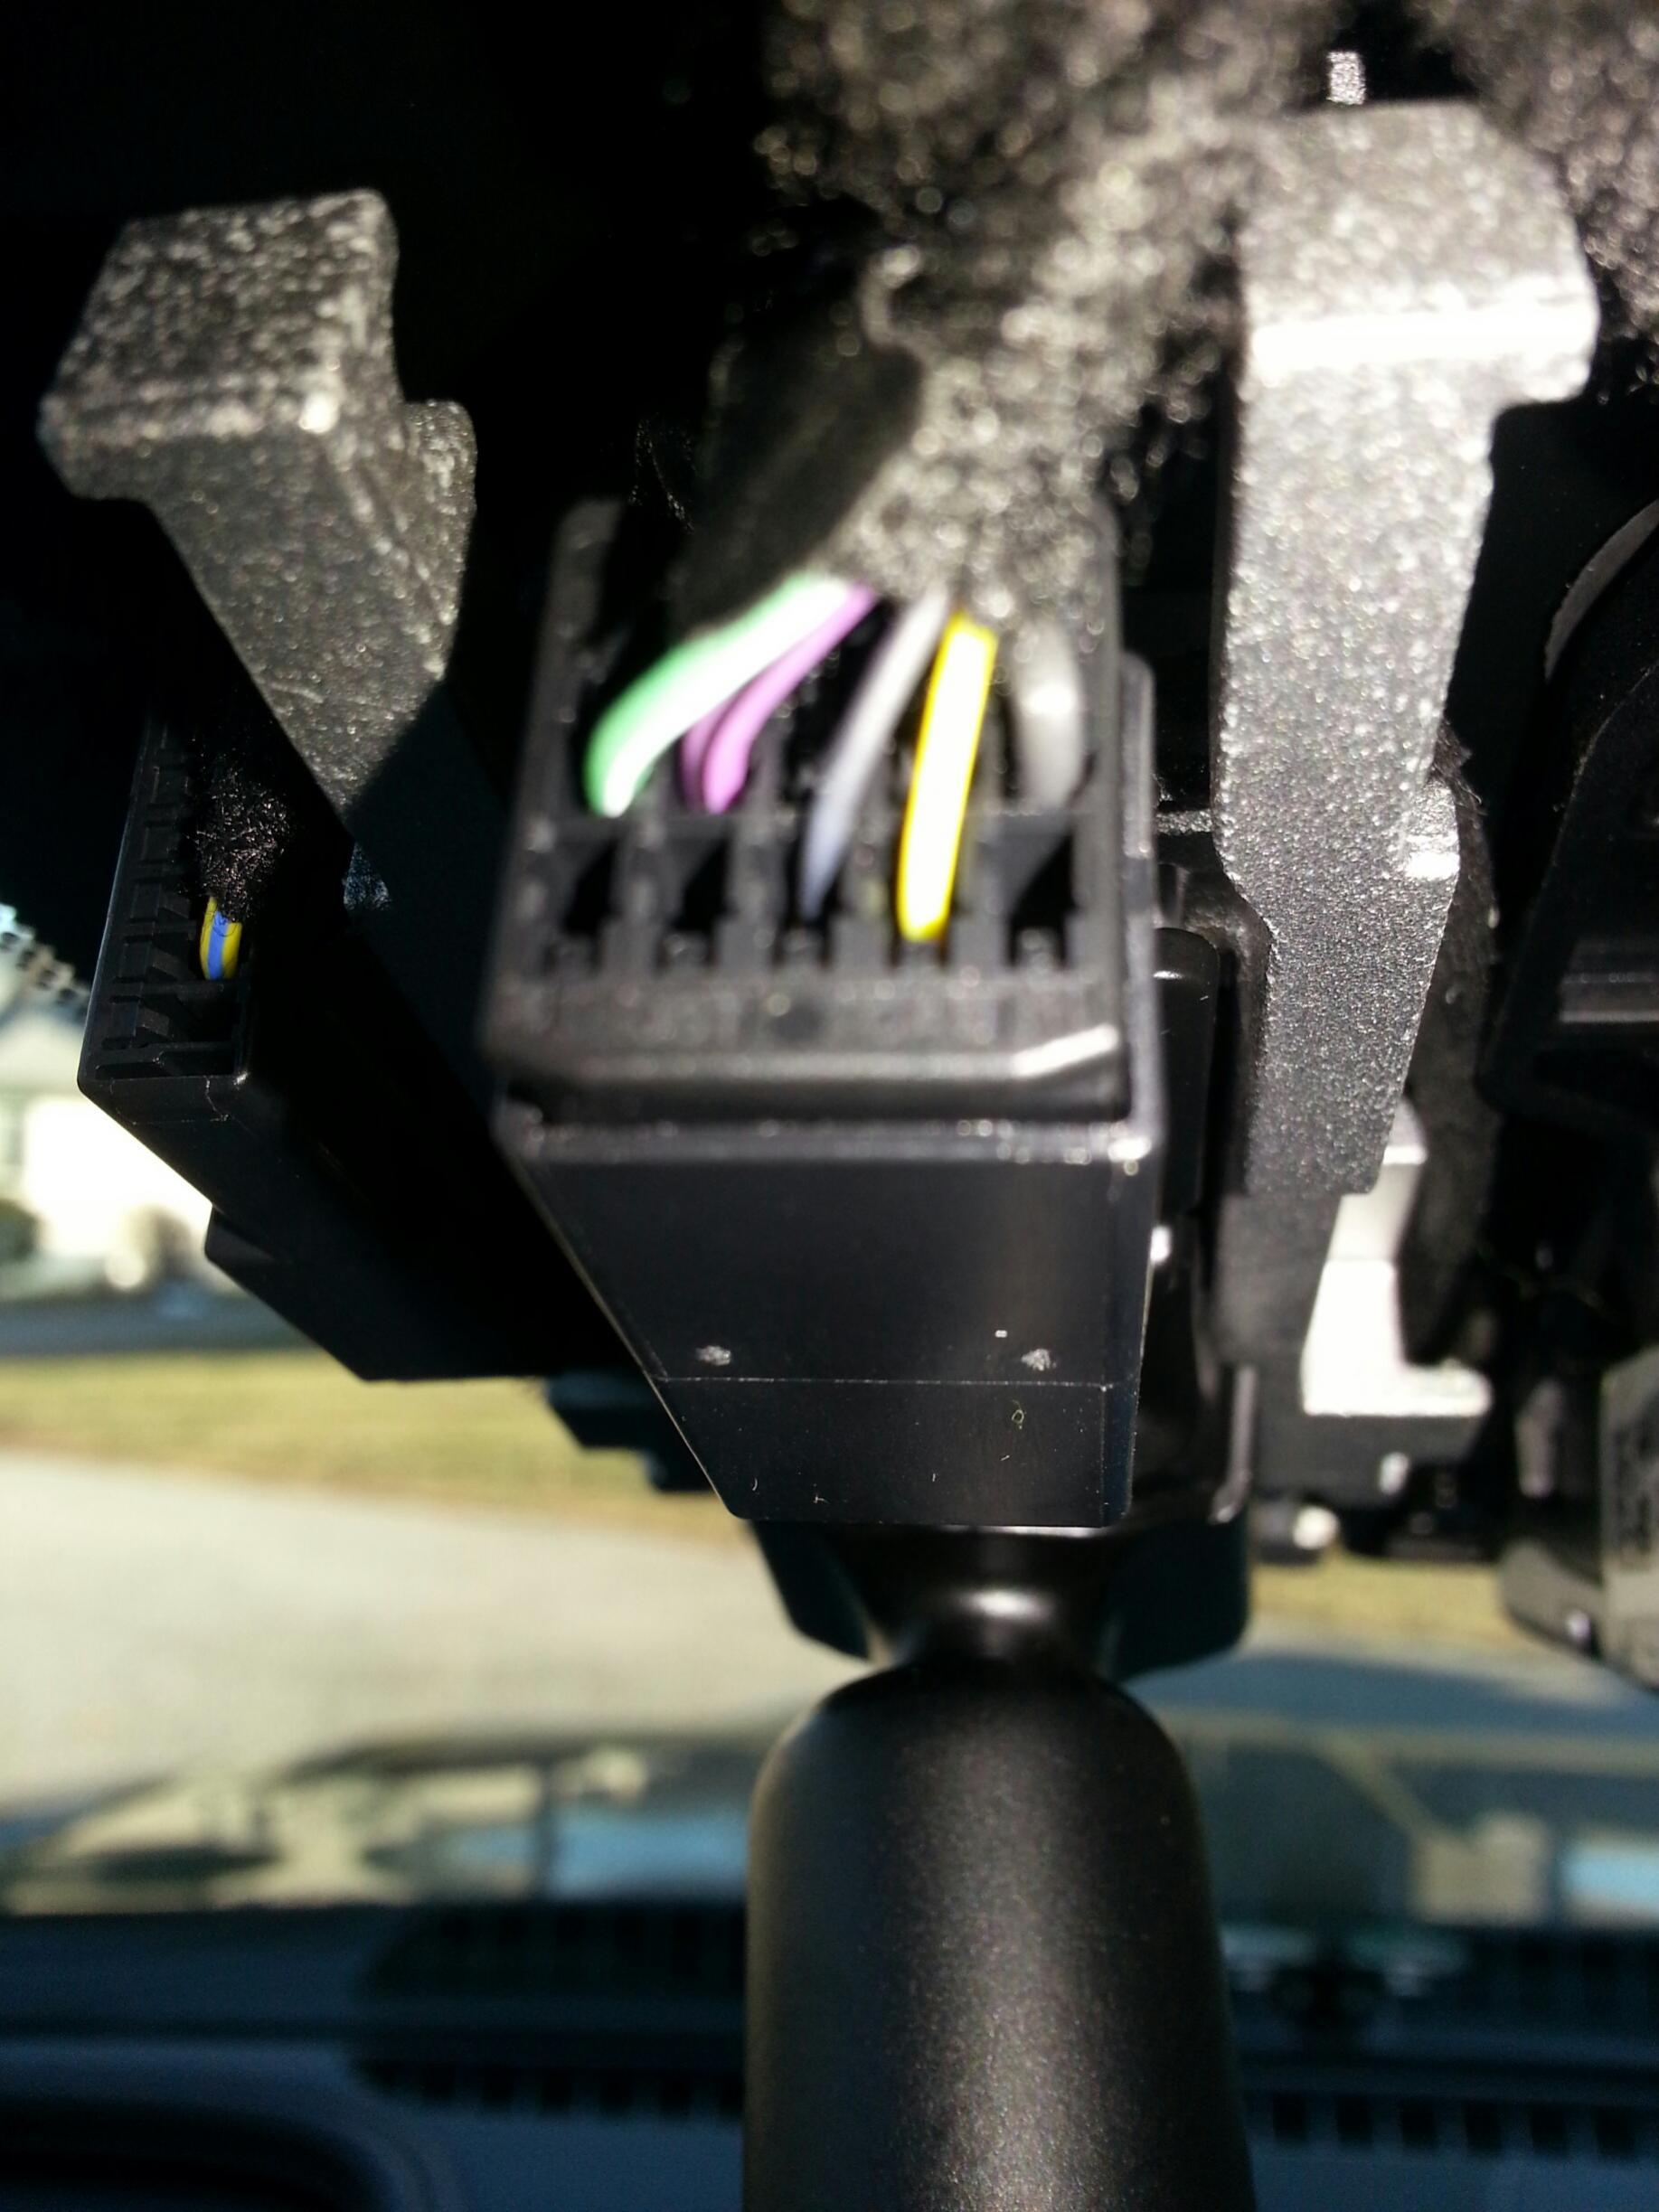 2006 Chevy Silverado Wiring Diagram 2014 Impala Ltz Mirror Tap Blend Mount For Radar Detector